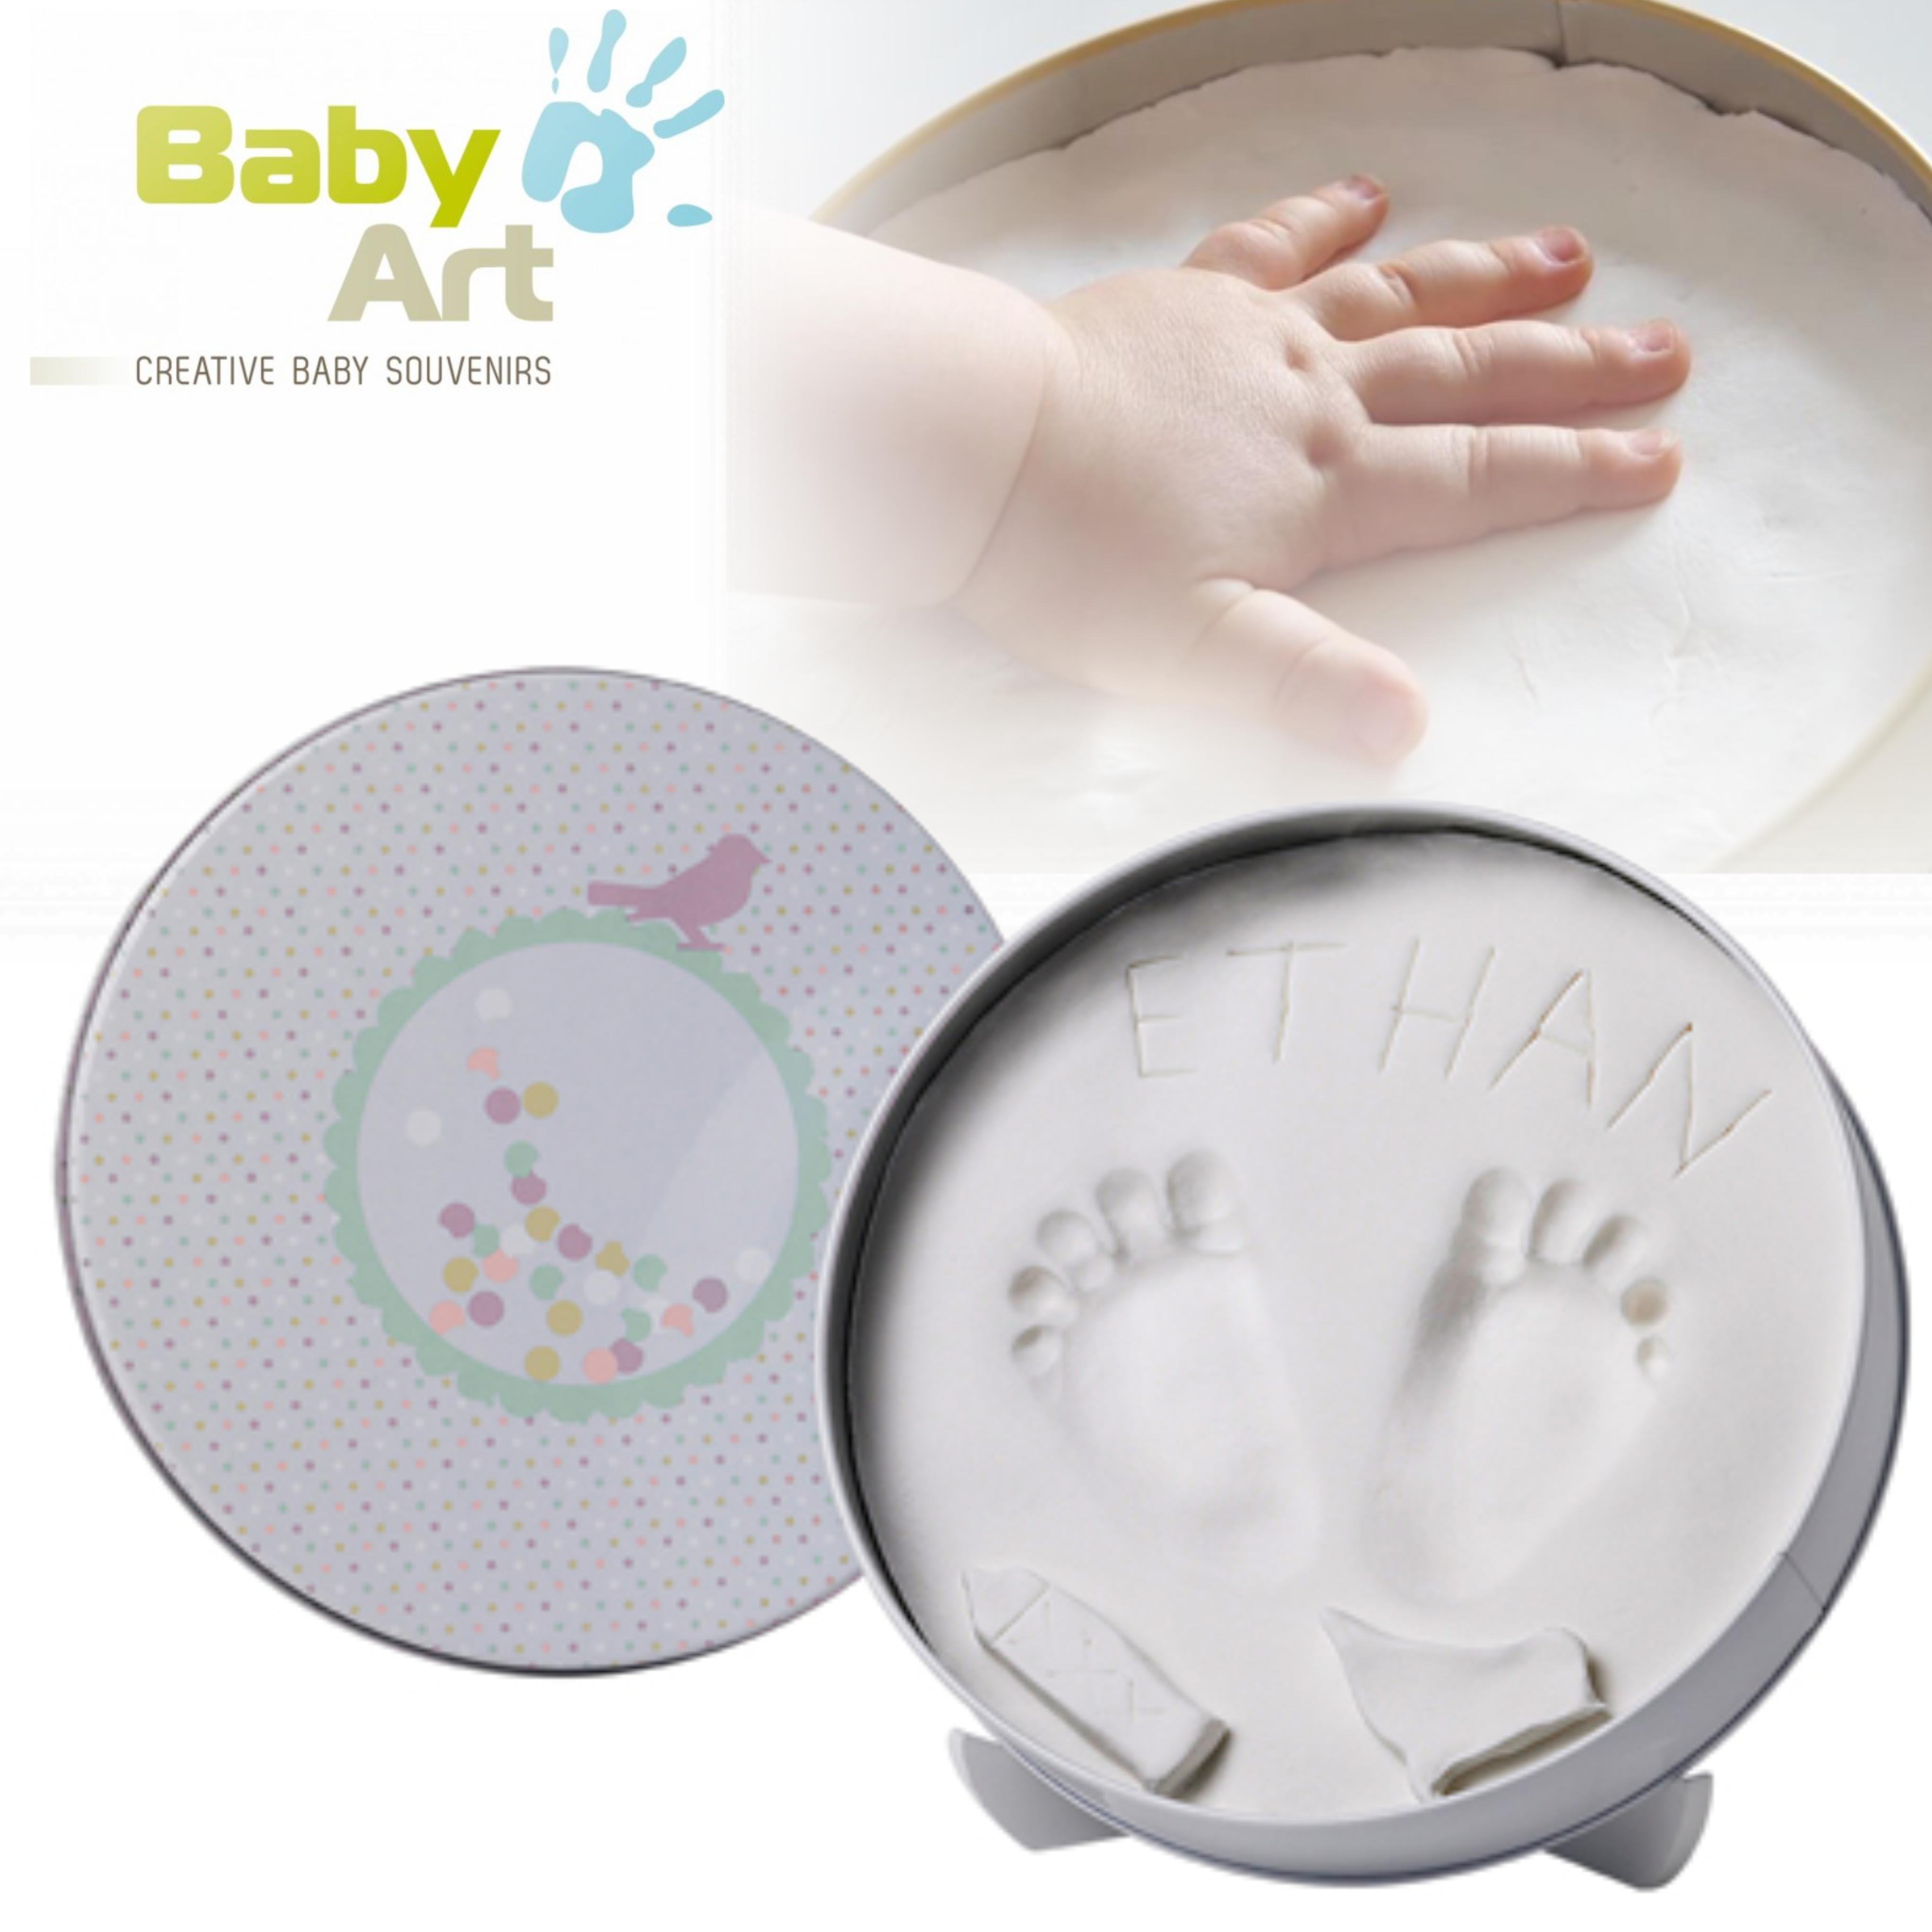 Baby Art Magic Box Confetti/Creative Souvenir | Hand/Foot Imprint Kit Of Newborn